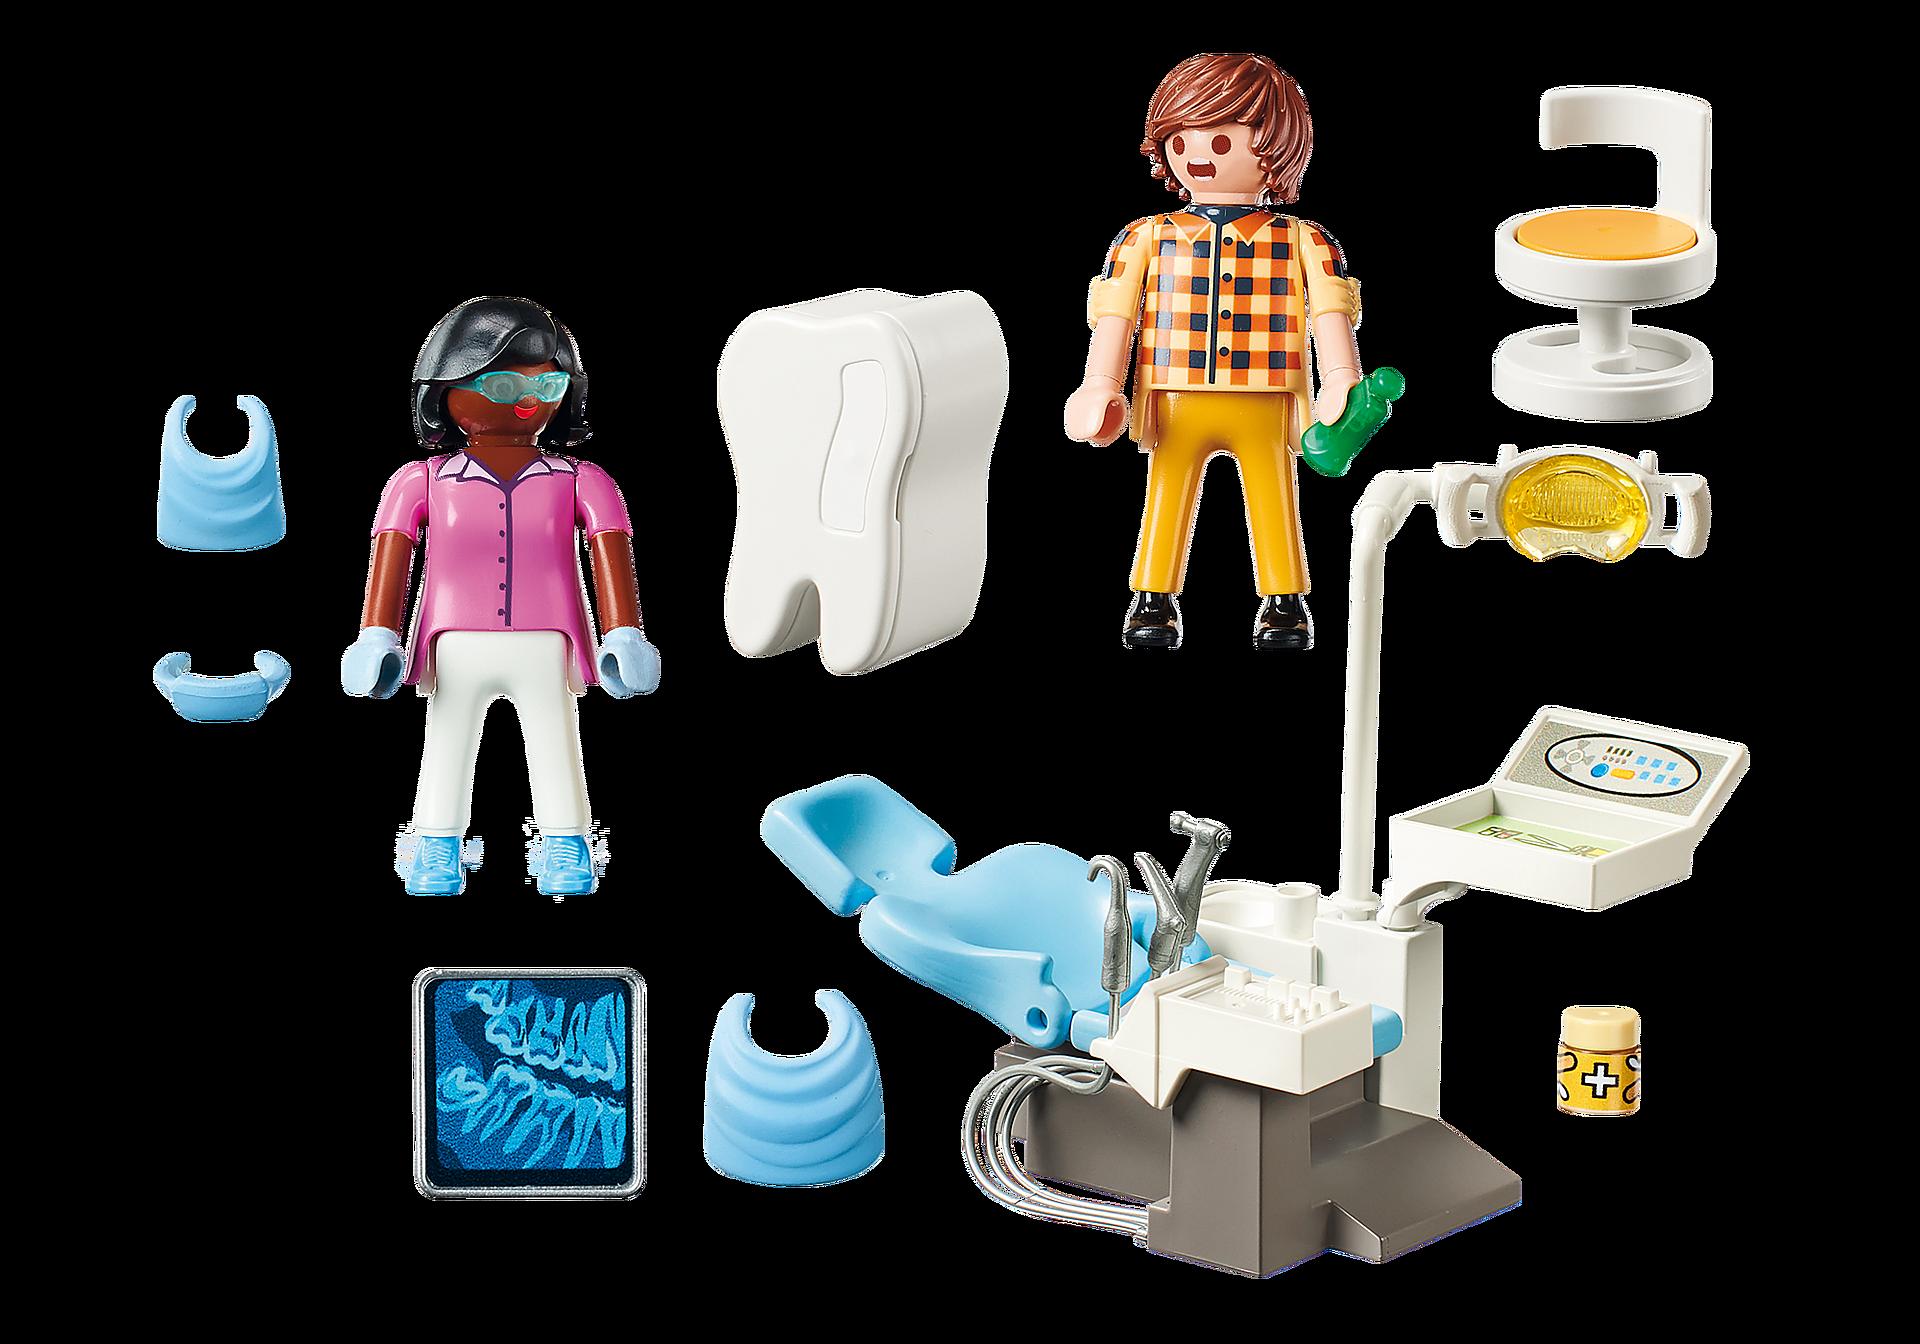 beim facharzt zahnarzt 70198 playmobil 174 schweiz